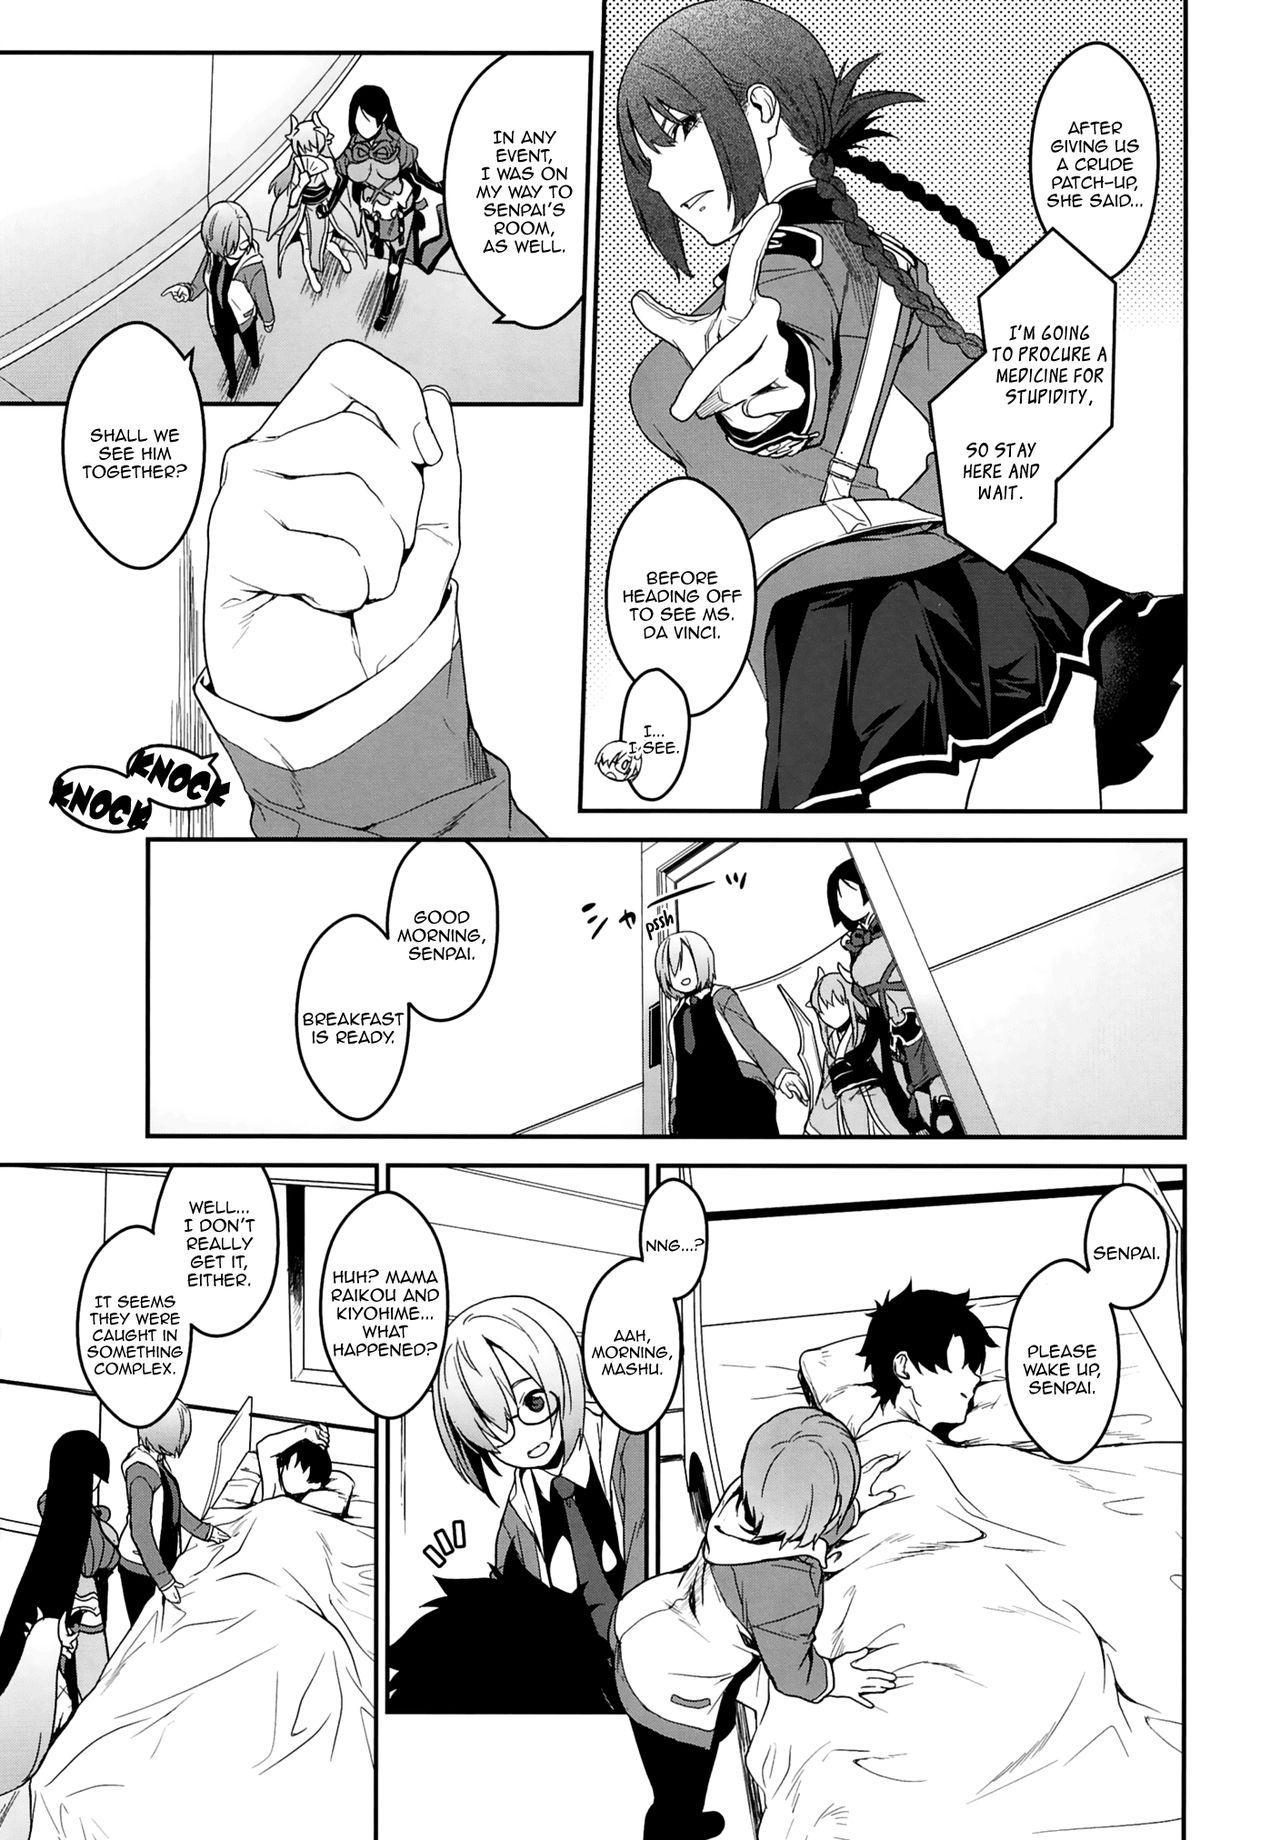 [MARCH (Minakuchi Takashi)] Seihitsu-chan In My Room | Serenity-chan in My Room (Fate/Grand Order) [English] [Aoitenshi] [Digital] 26